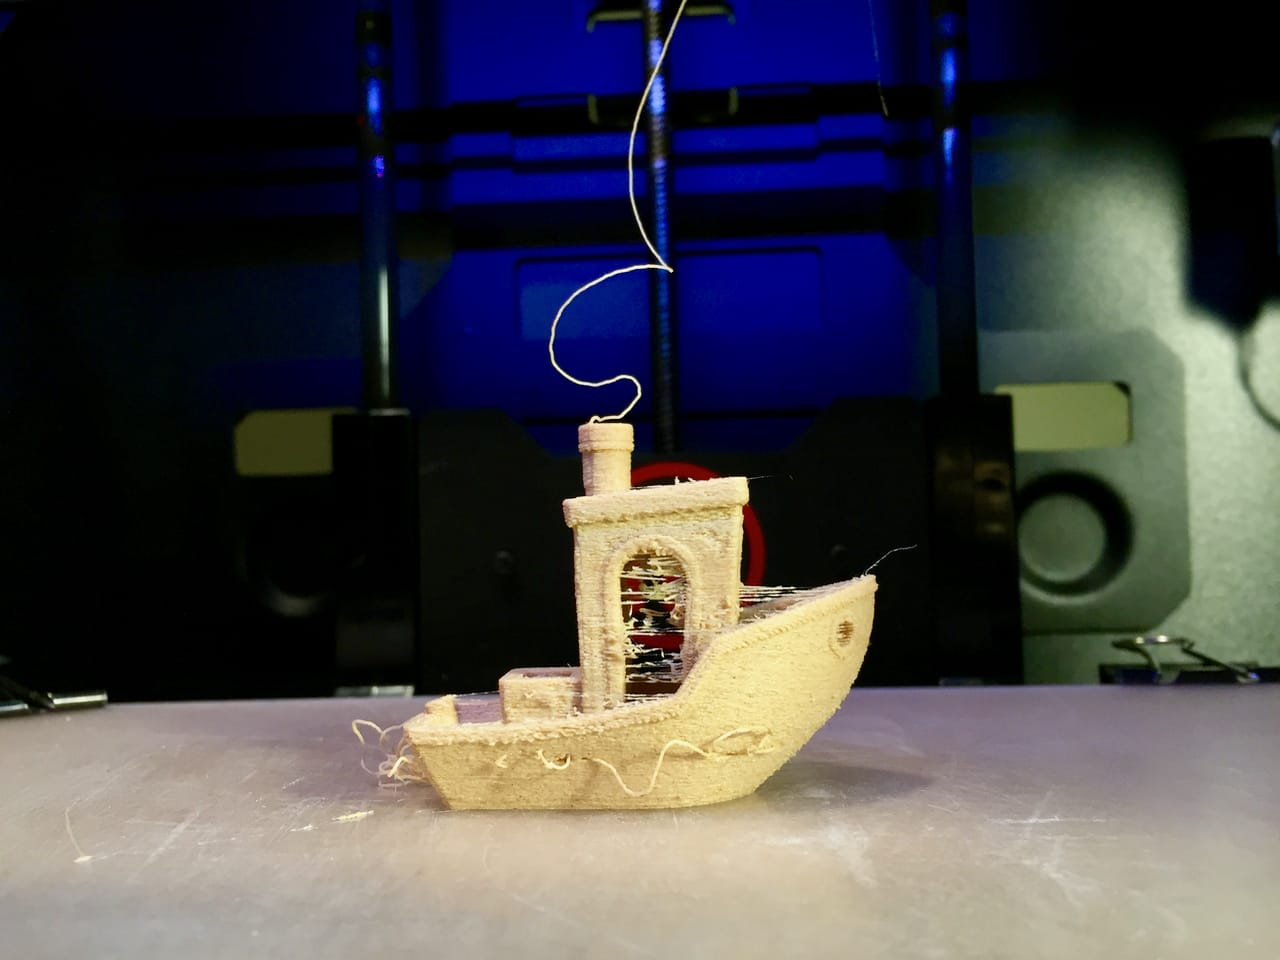 Fiberlogy's Fiberwood 3D printer filament often seems a bit drippy